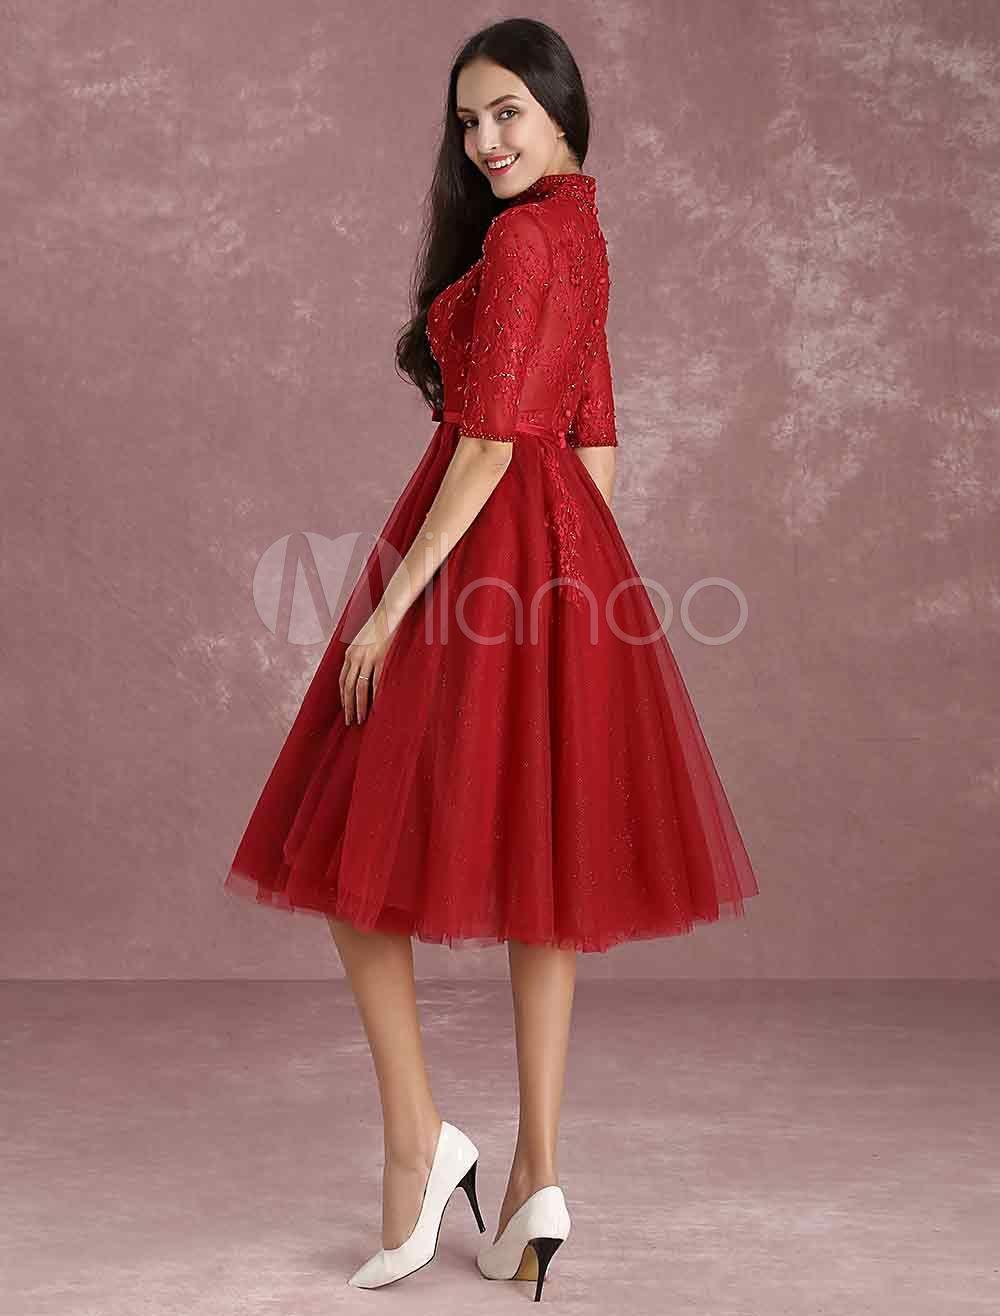 43b92adb86 Burgundy Homecoming Dress Tulle Short Prom Dresses Mandarin Collar Half  Sleeve Button Lace Applique Beading Bow Sash A Line Tea Length Cocktail  Dress ...